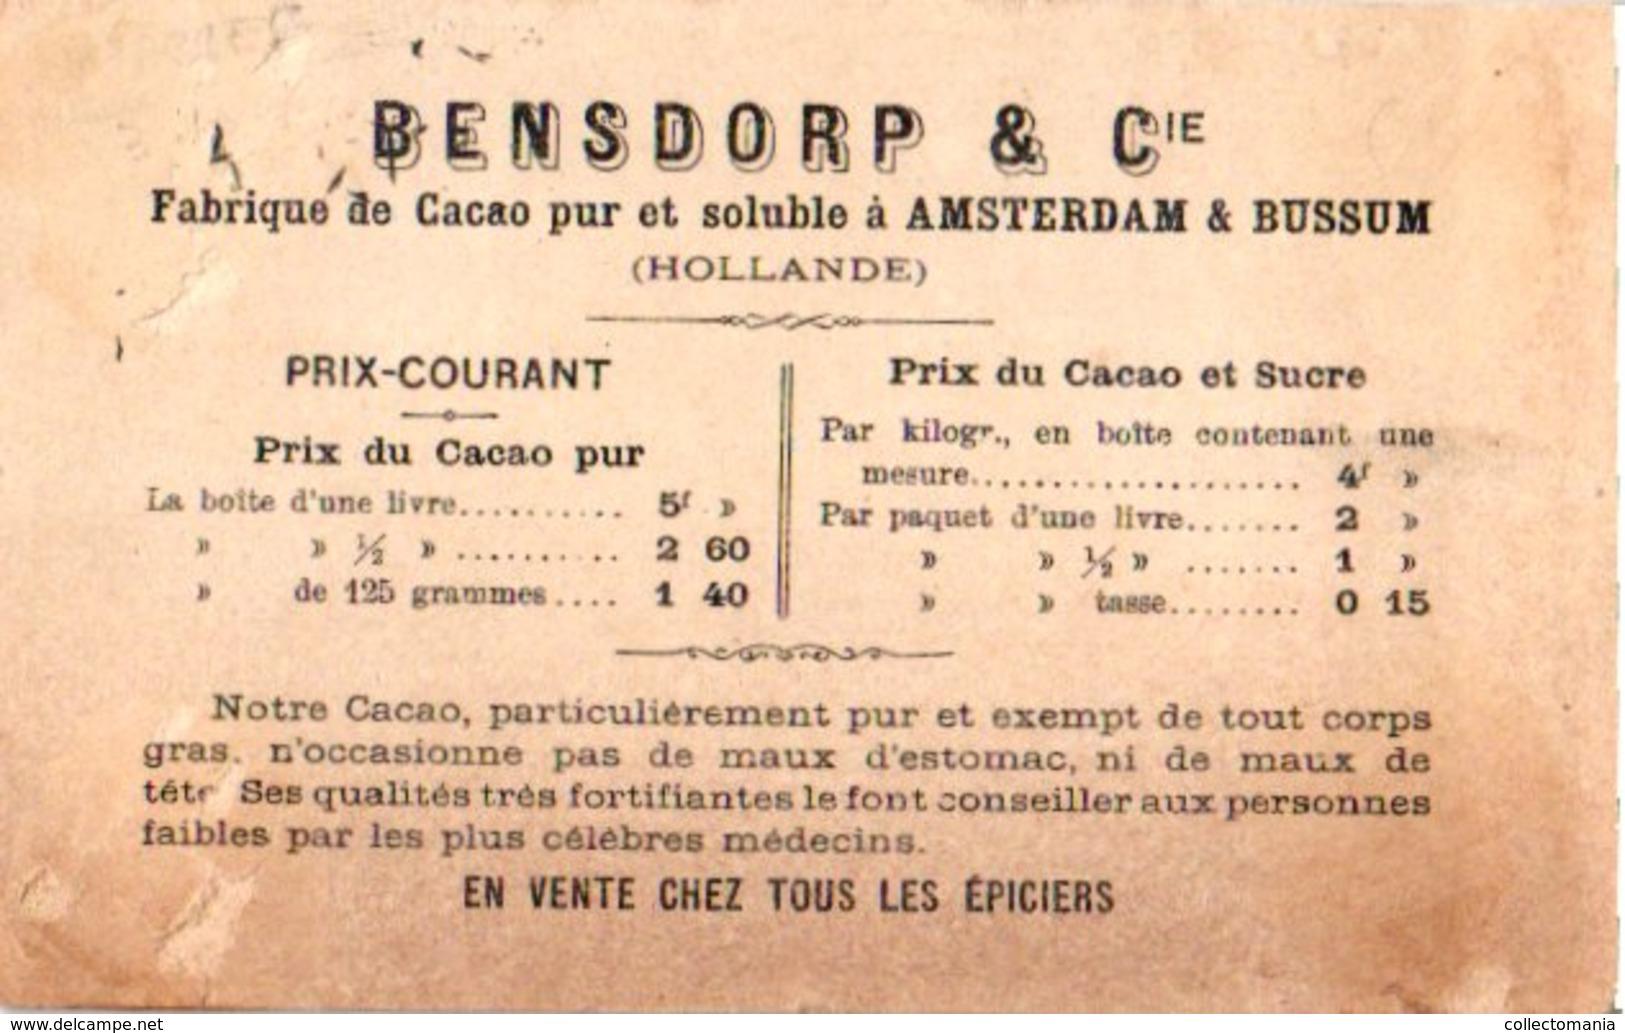 7 Chromo Litho PUB C1880 à 1890 BENSDORP Chocolate Chokolade, Gedrukt Voor Frankrijk France Apporx. 7X10,5cm - Other